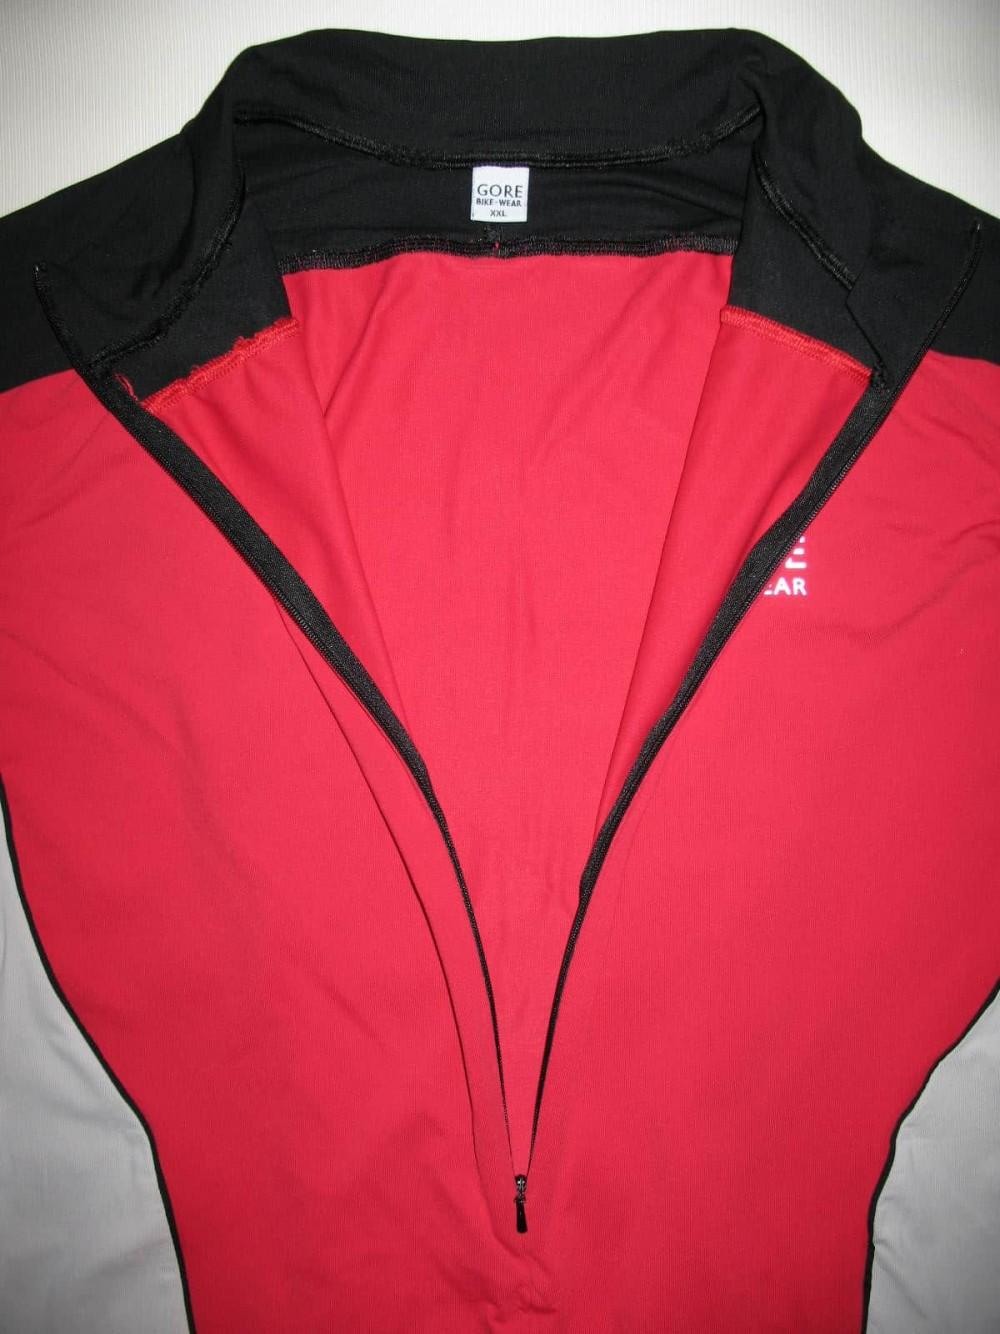 Веломайка GORE bike wear cycling jersey (размер XXL) - 2